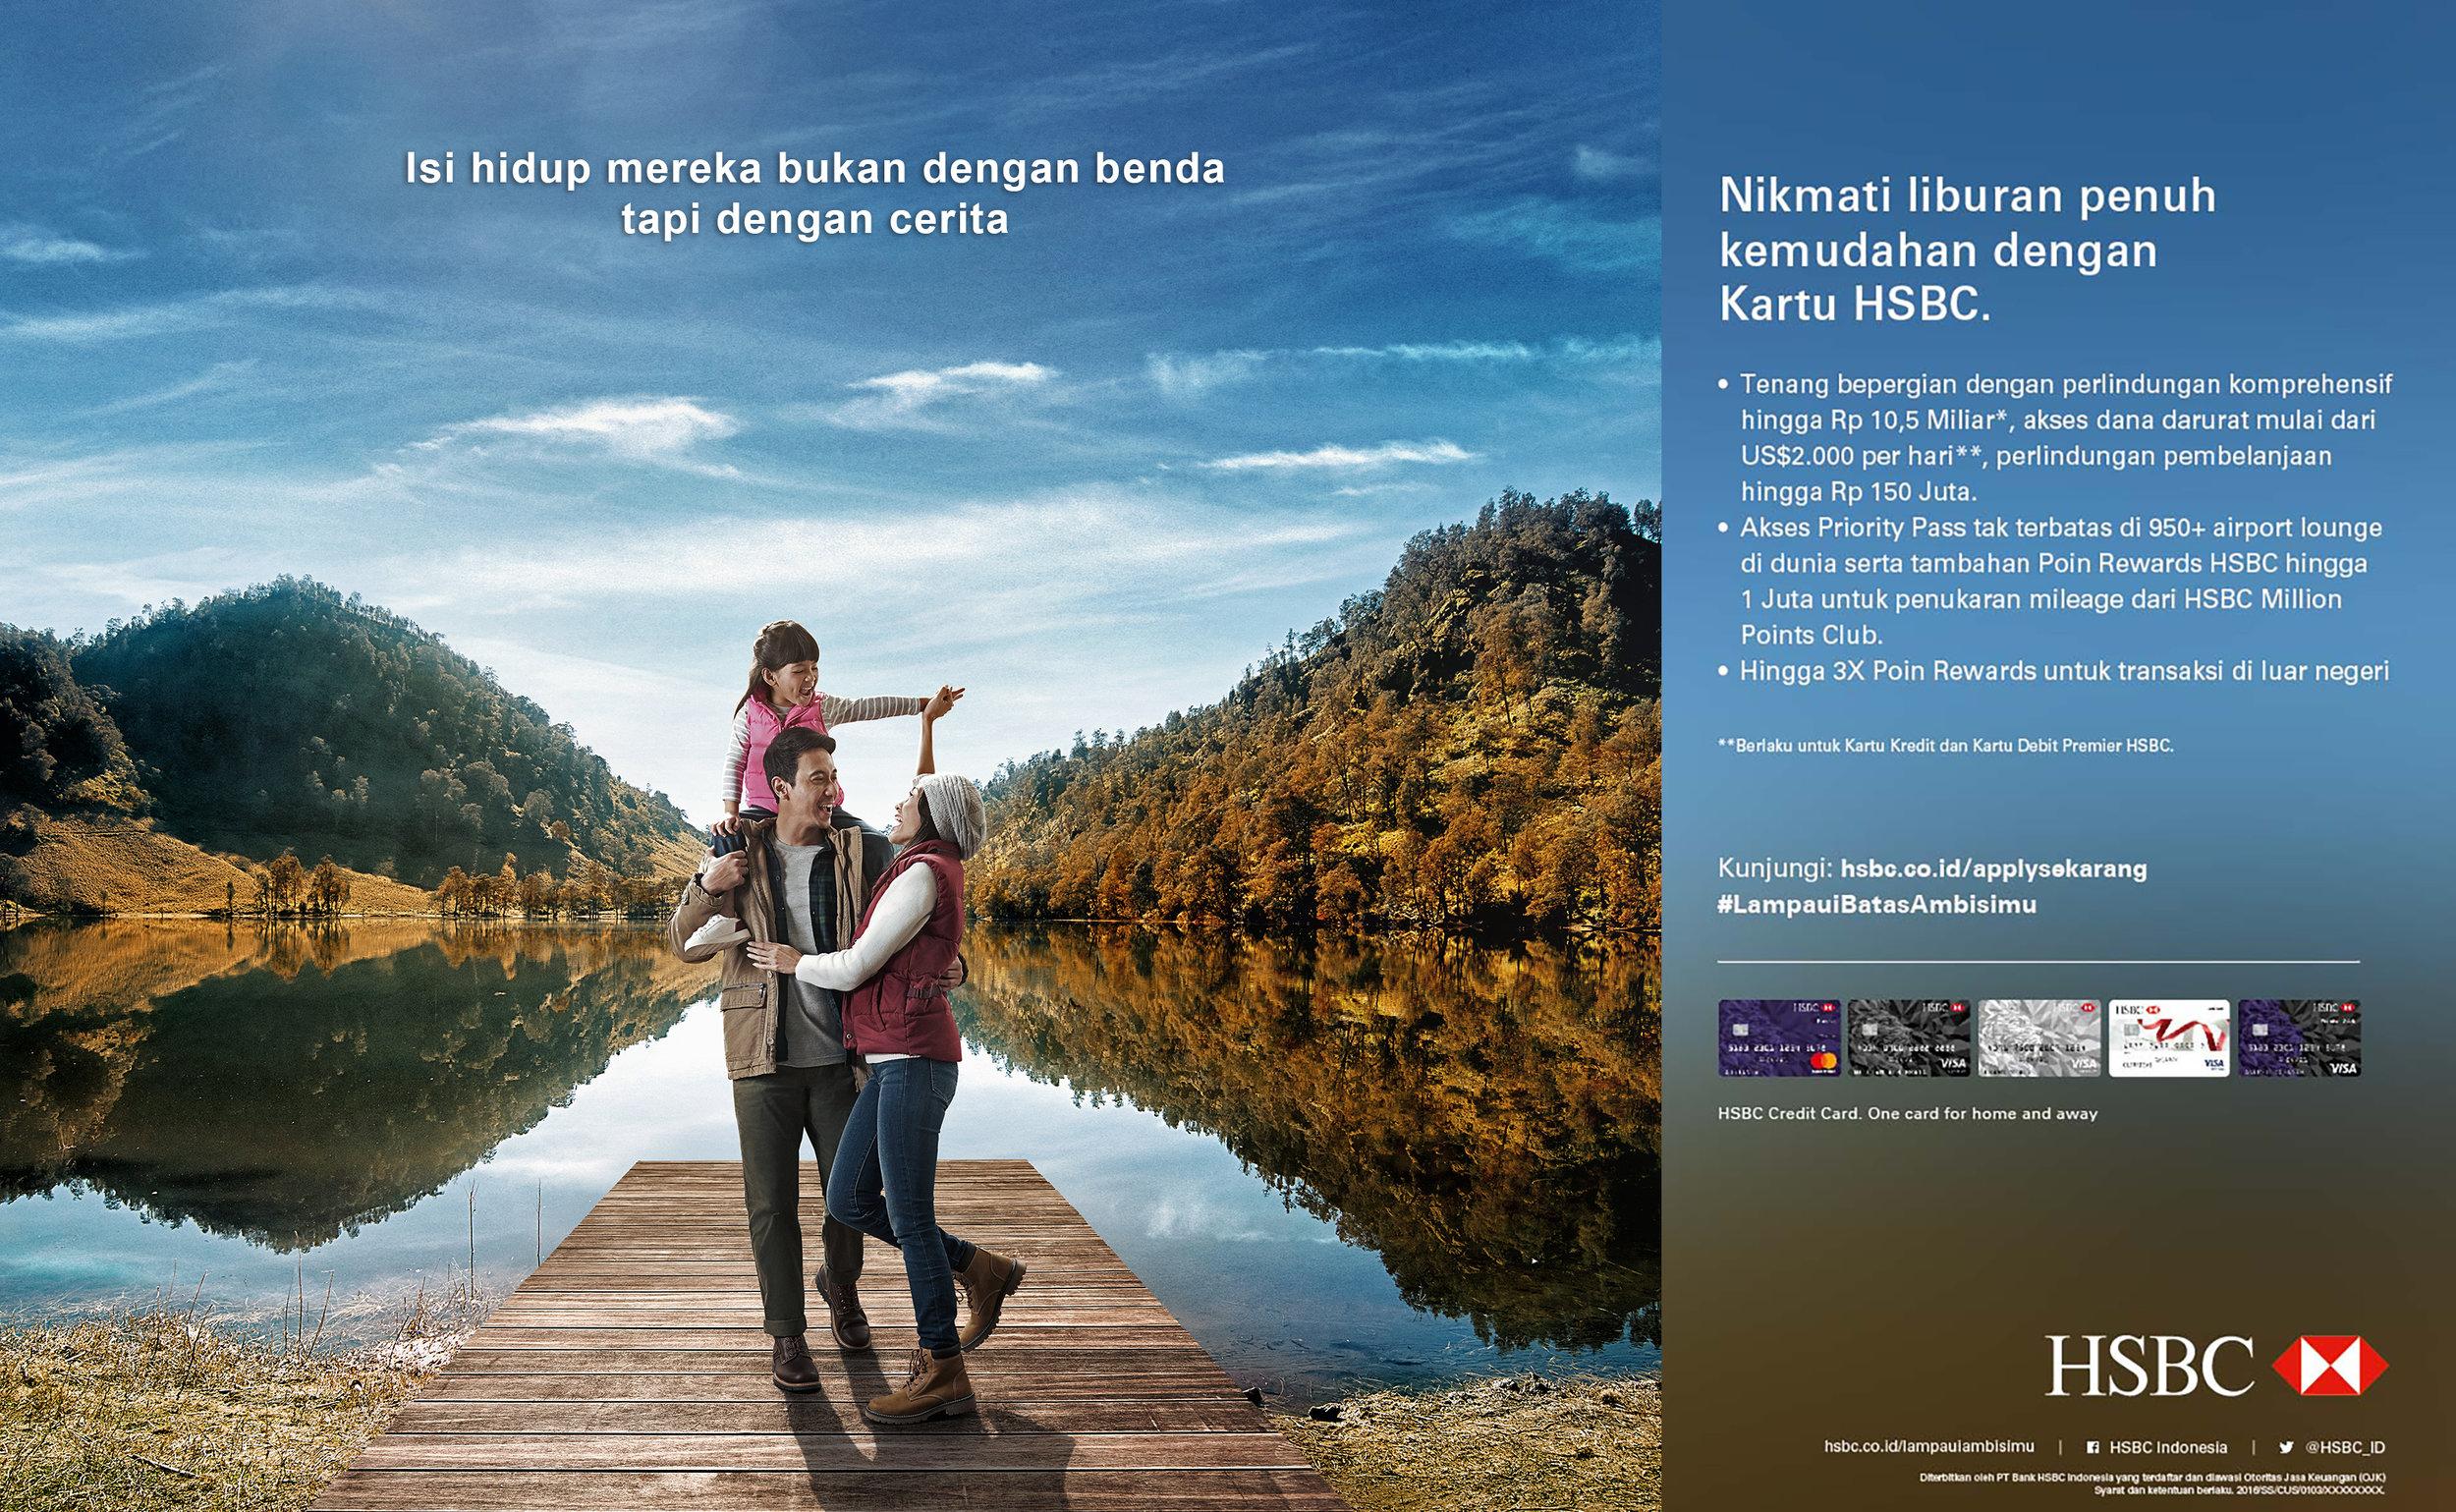 HSBC Travel Micro_325x200mm-01.jpg